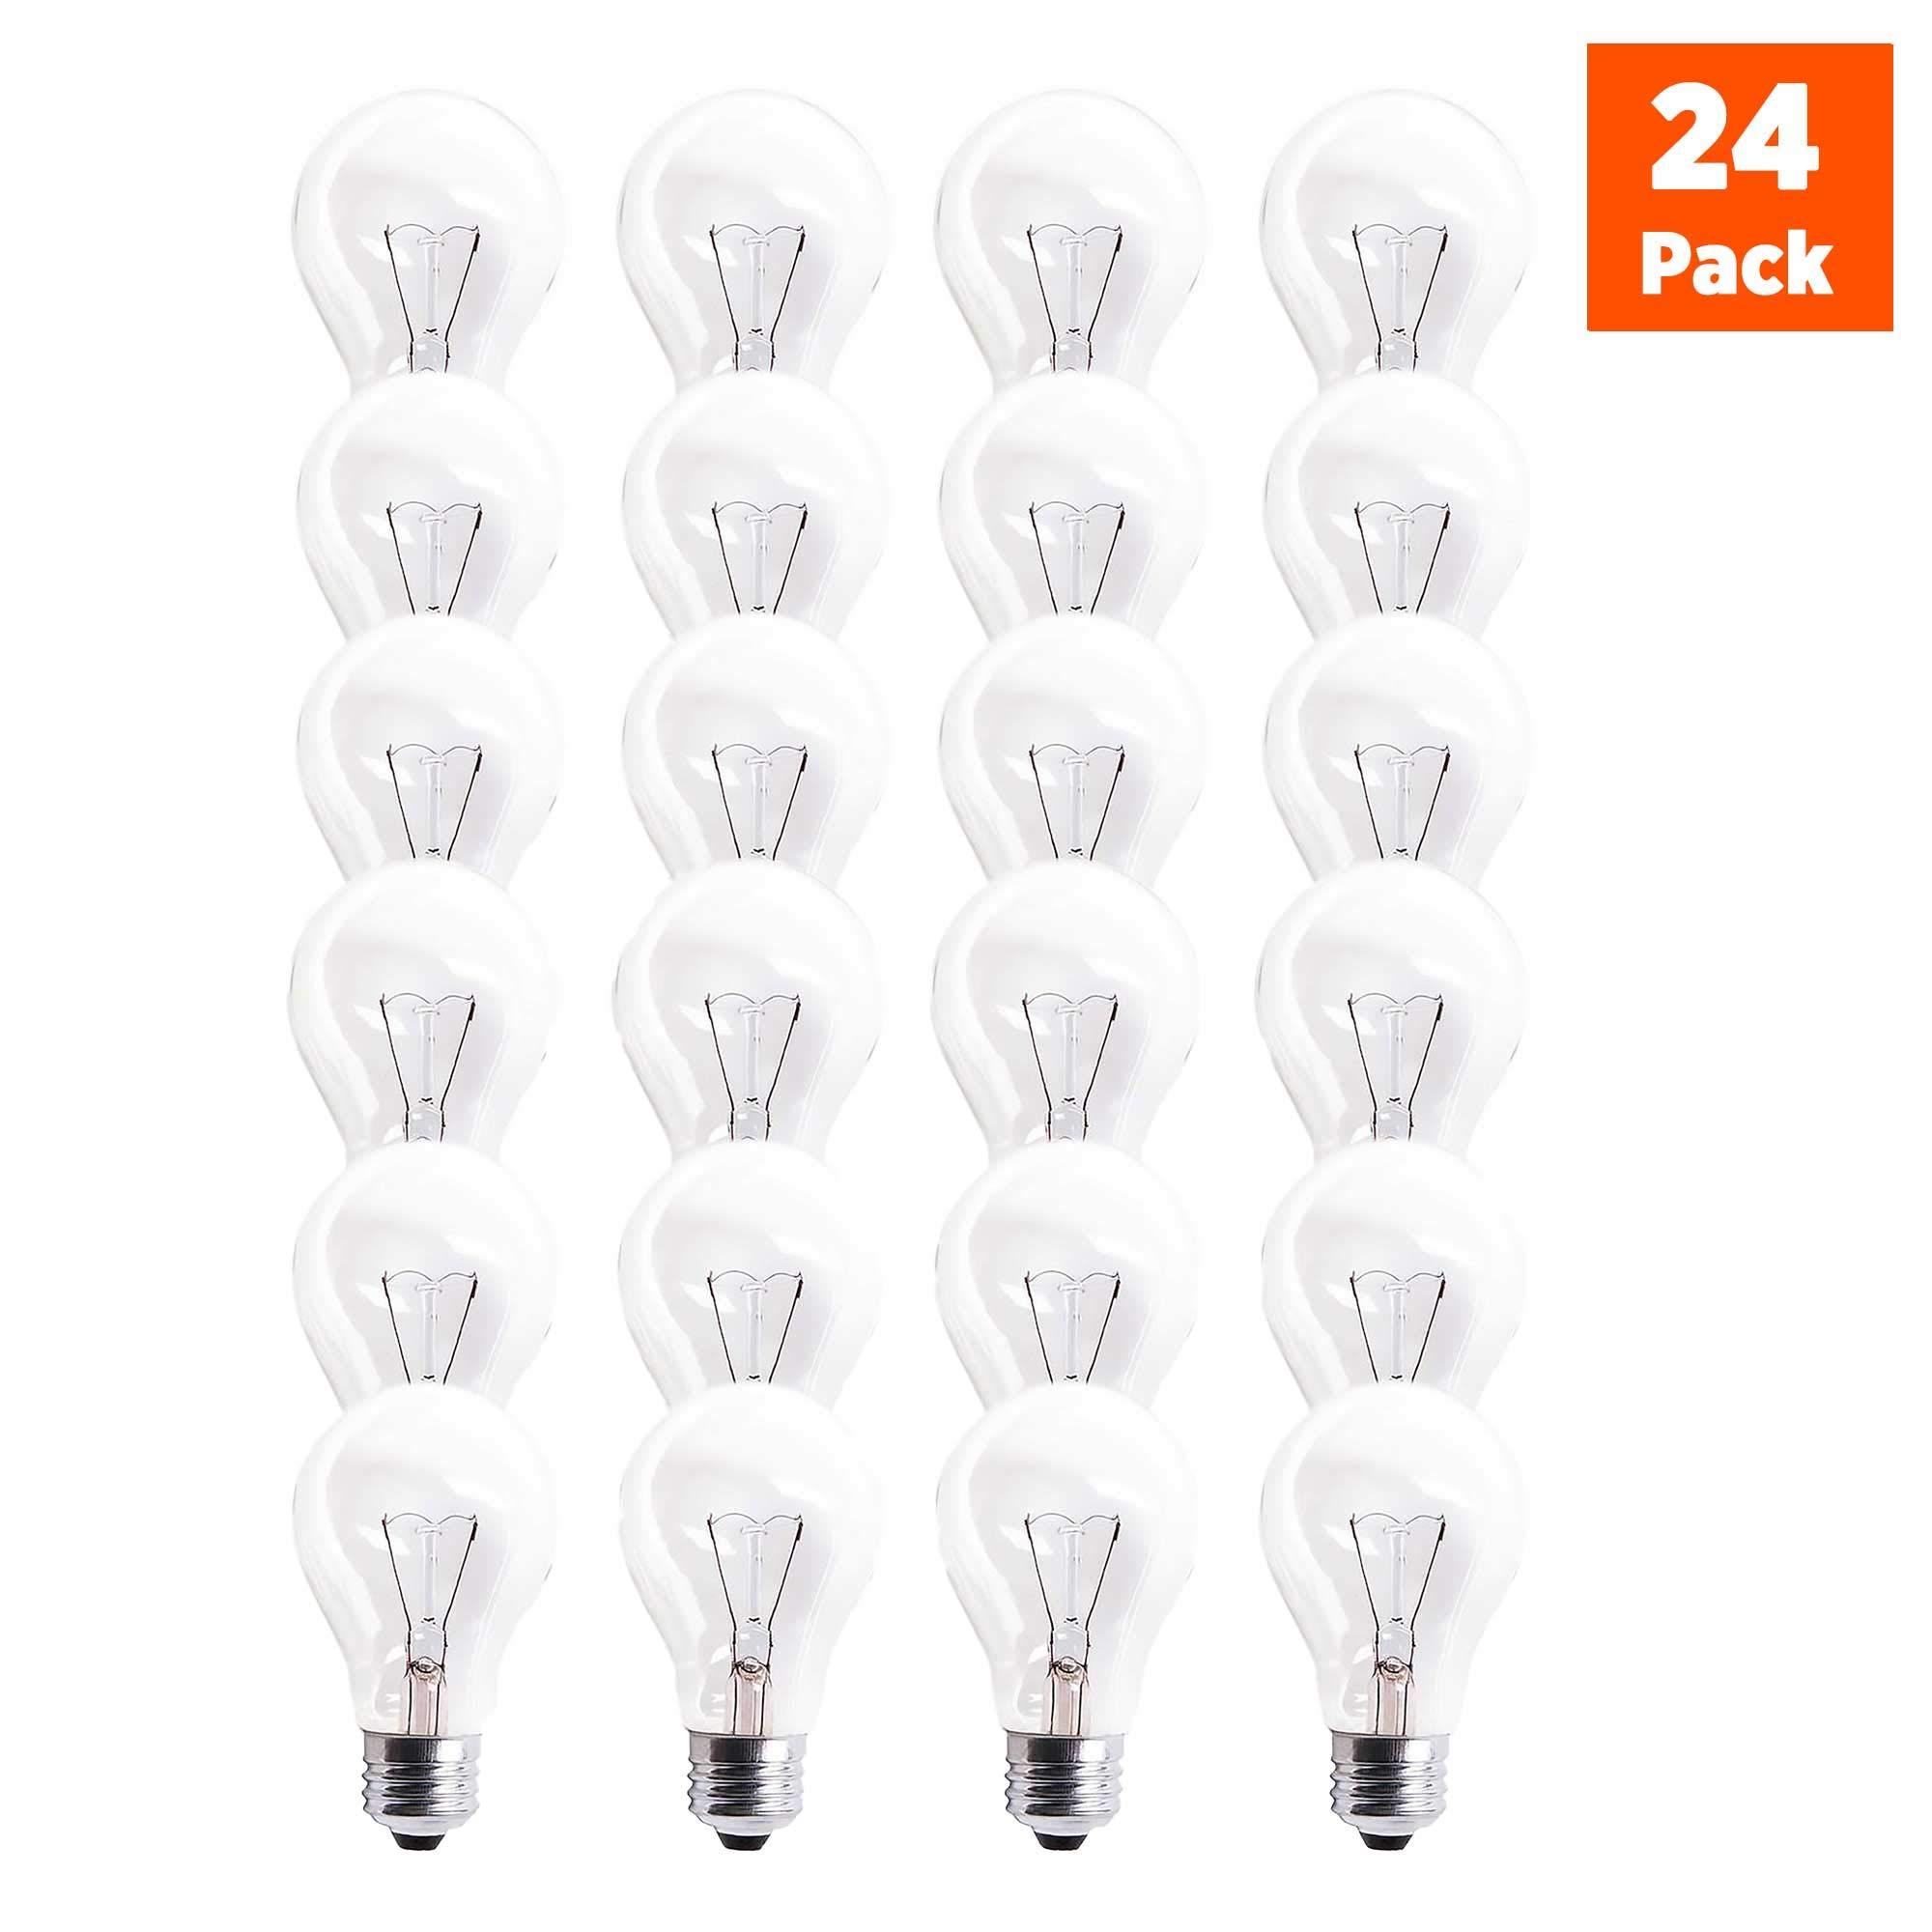 GoodBulb 60 Watt Light Bulbs, Dimmable A19 Bulb with E26 Base, Rough Service Bulb, Clear Energy-Efficient Incandescent Bulbs, 525 Lumens, 130 Volts, for Various Light Fixtures (24 Pack)